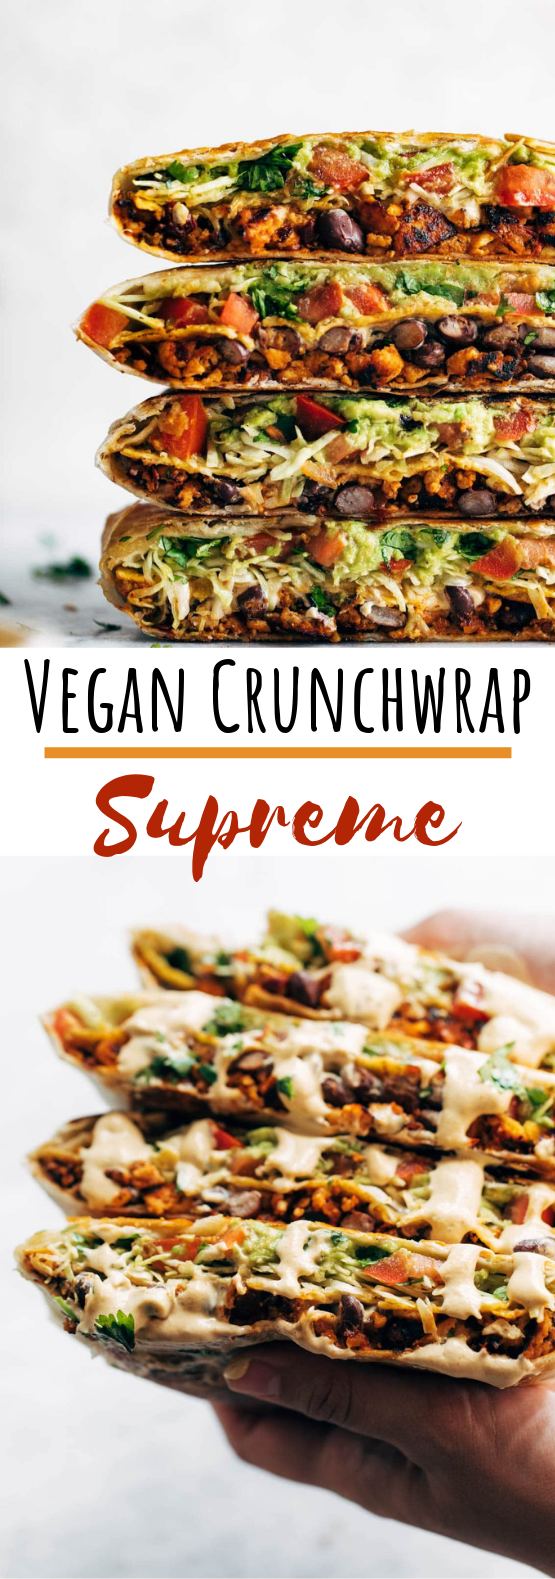 Vegan Crunchwrap Supreme #lunch #vegetarian